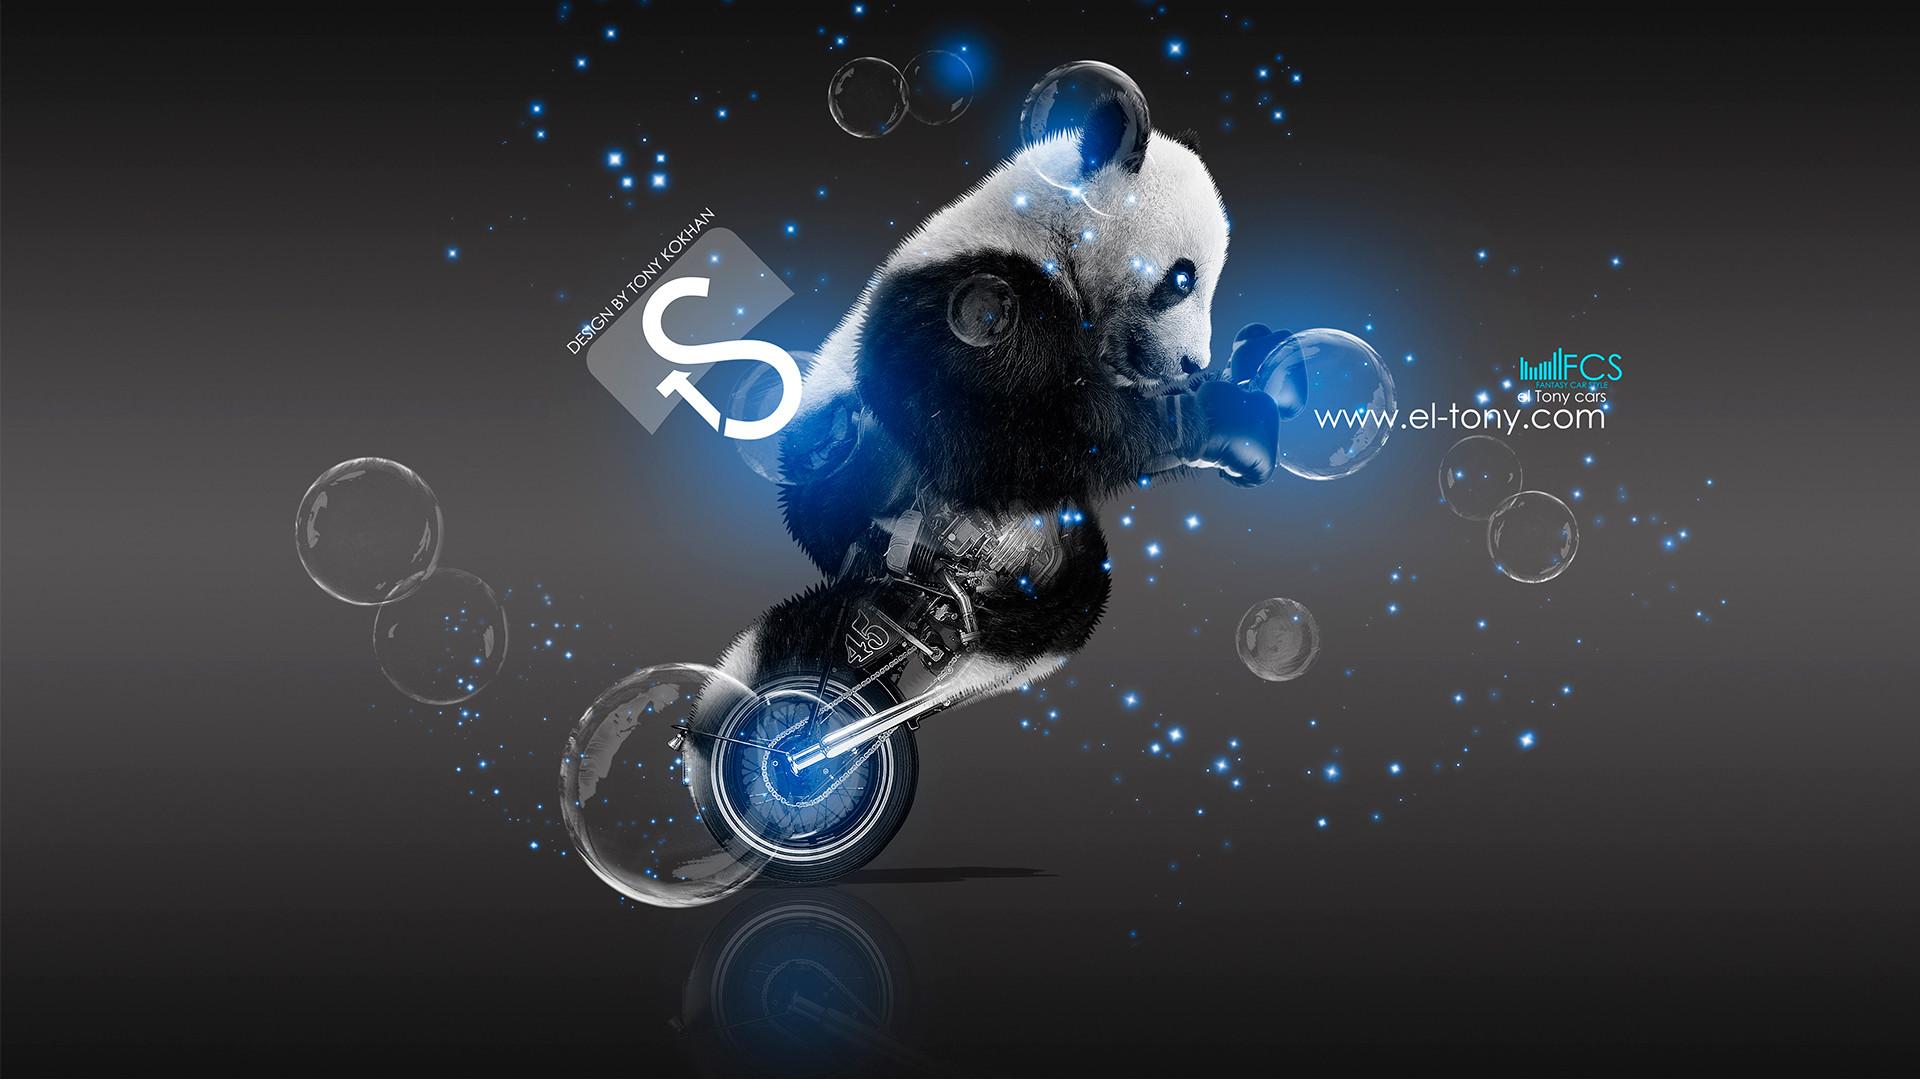 Res: 1920x1080, Moto-Retro-Fantasy-Panda-Blue-Boxing-Art-2013-HD-Wallpapers -by-Tony-Kokhan-[www.el-tony.com]